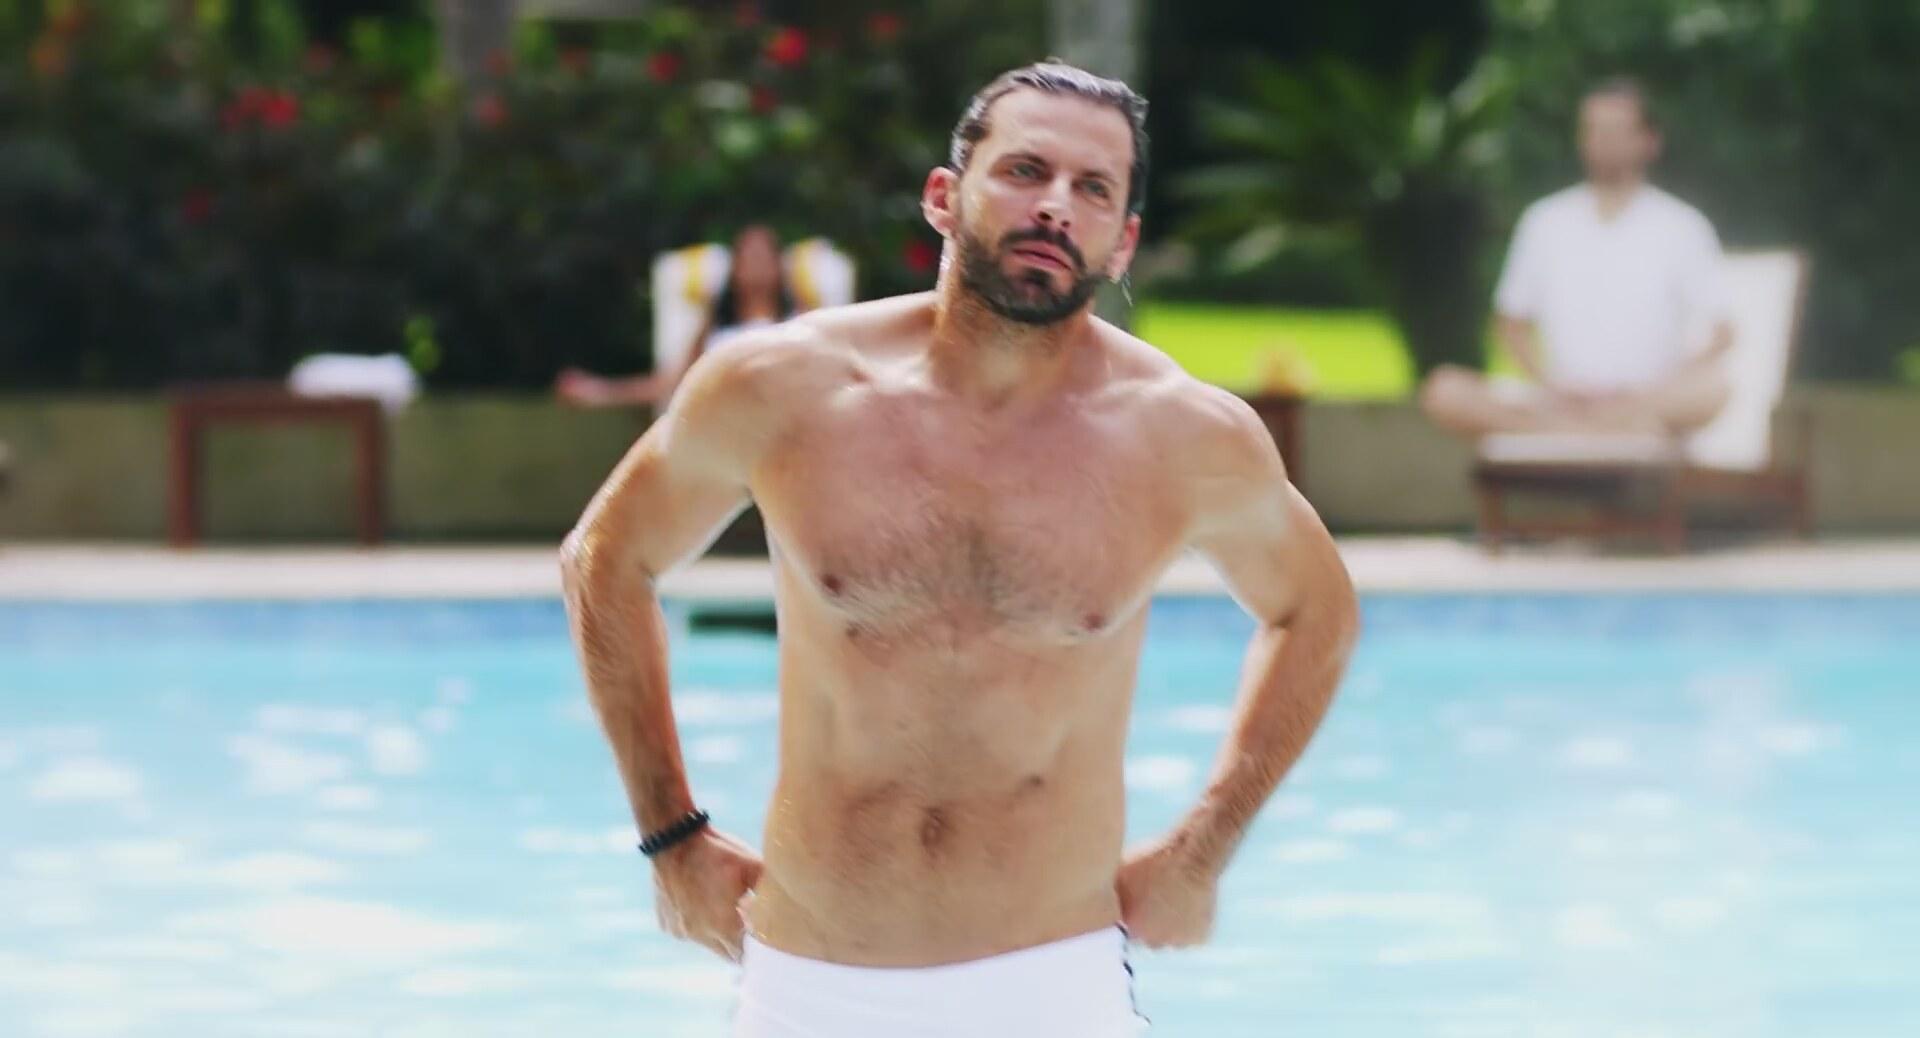 Asier Actor Porno Gay Español https://www.izlesene/video/freshman-2019-fragman